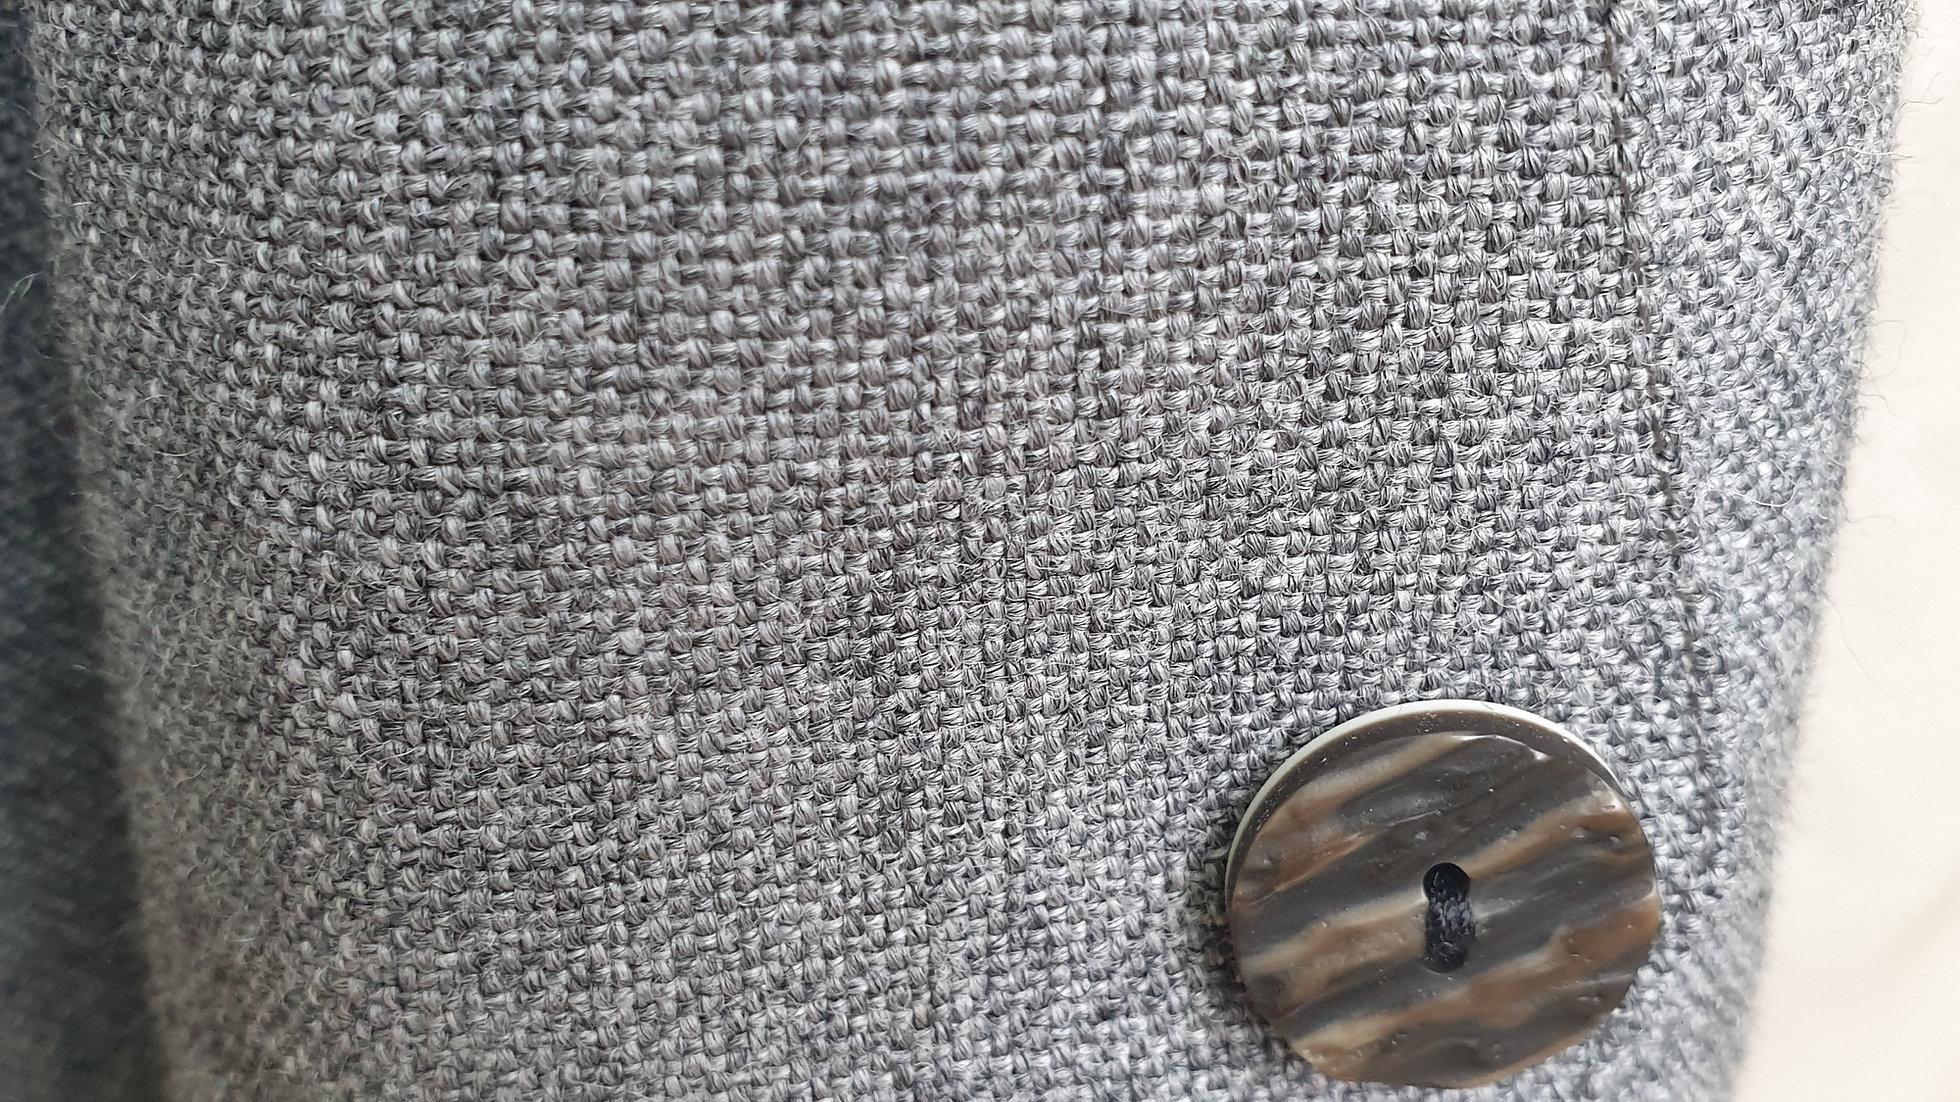 (HIRE) : FULL HIGHLAND DRESS KILT OUTFIT ROYAL STEWART